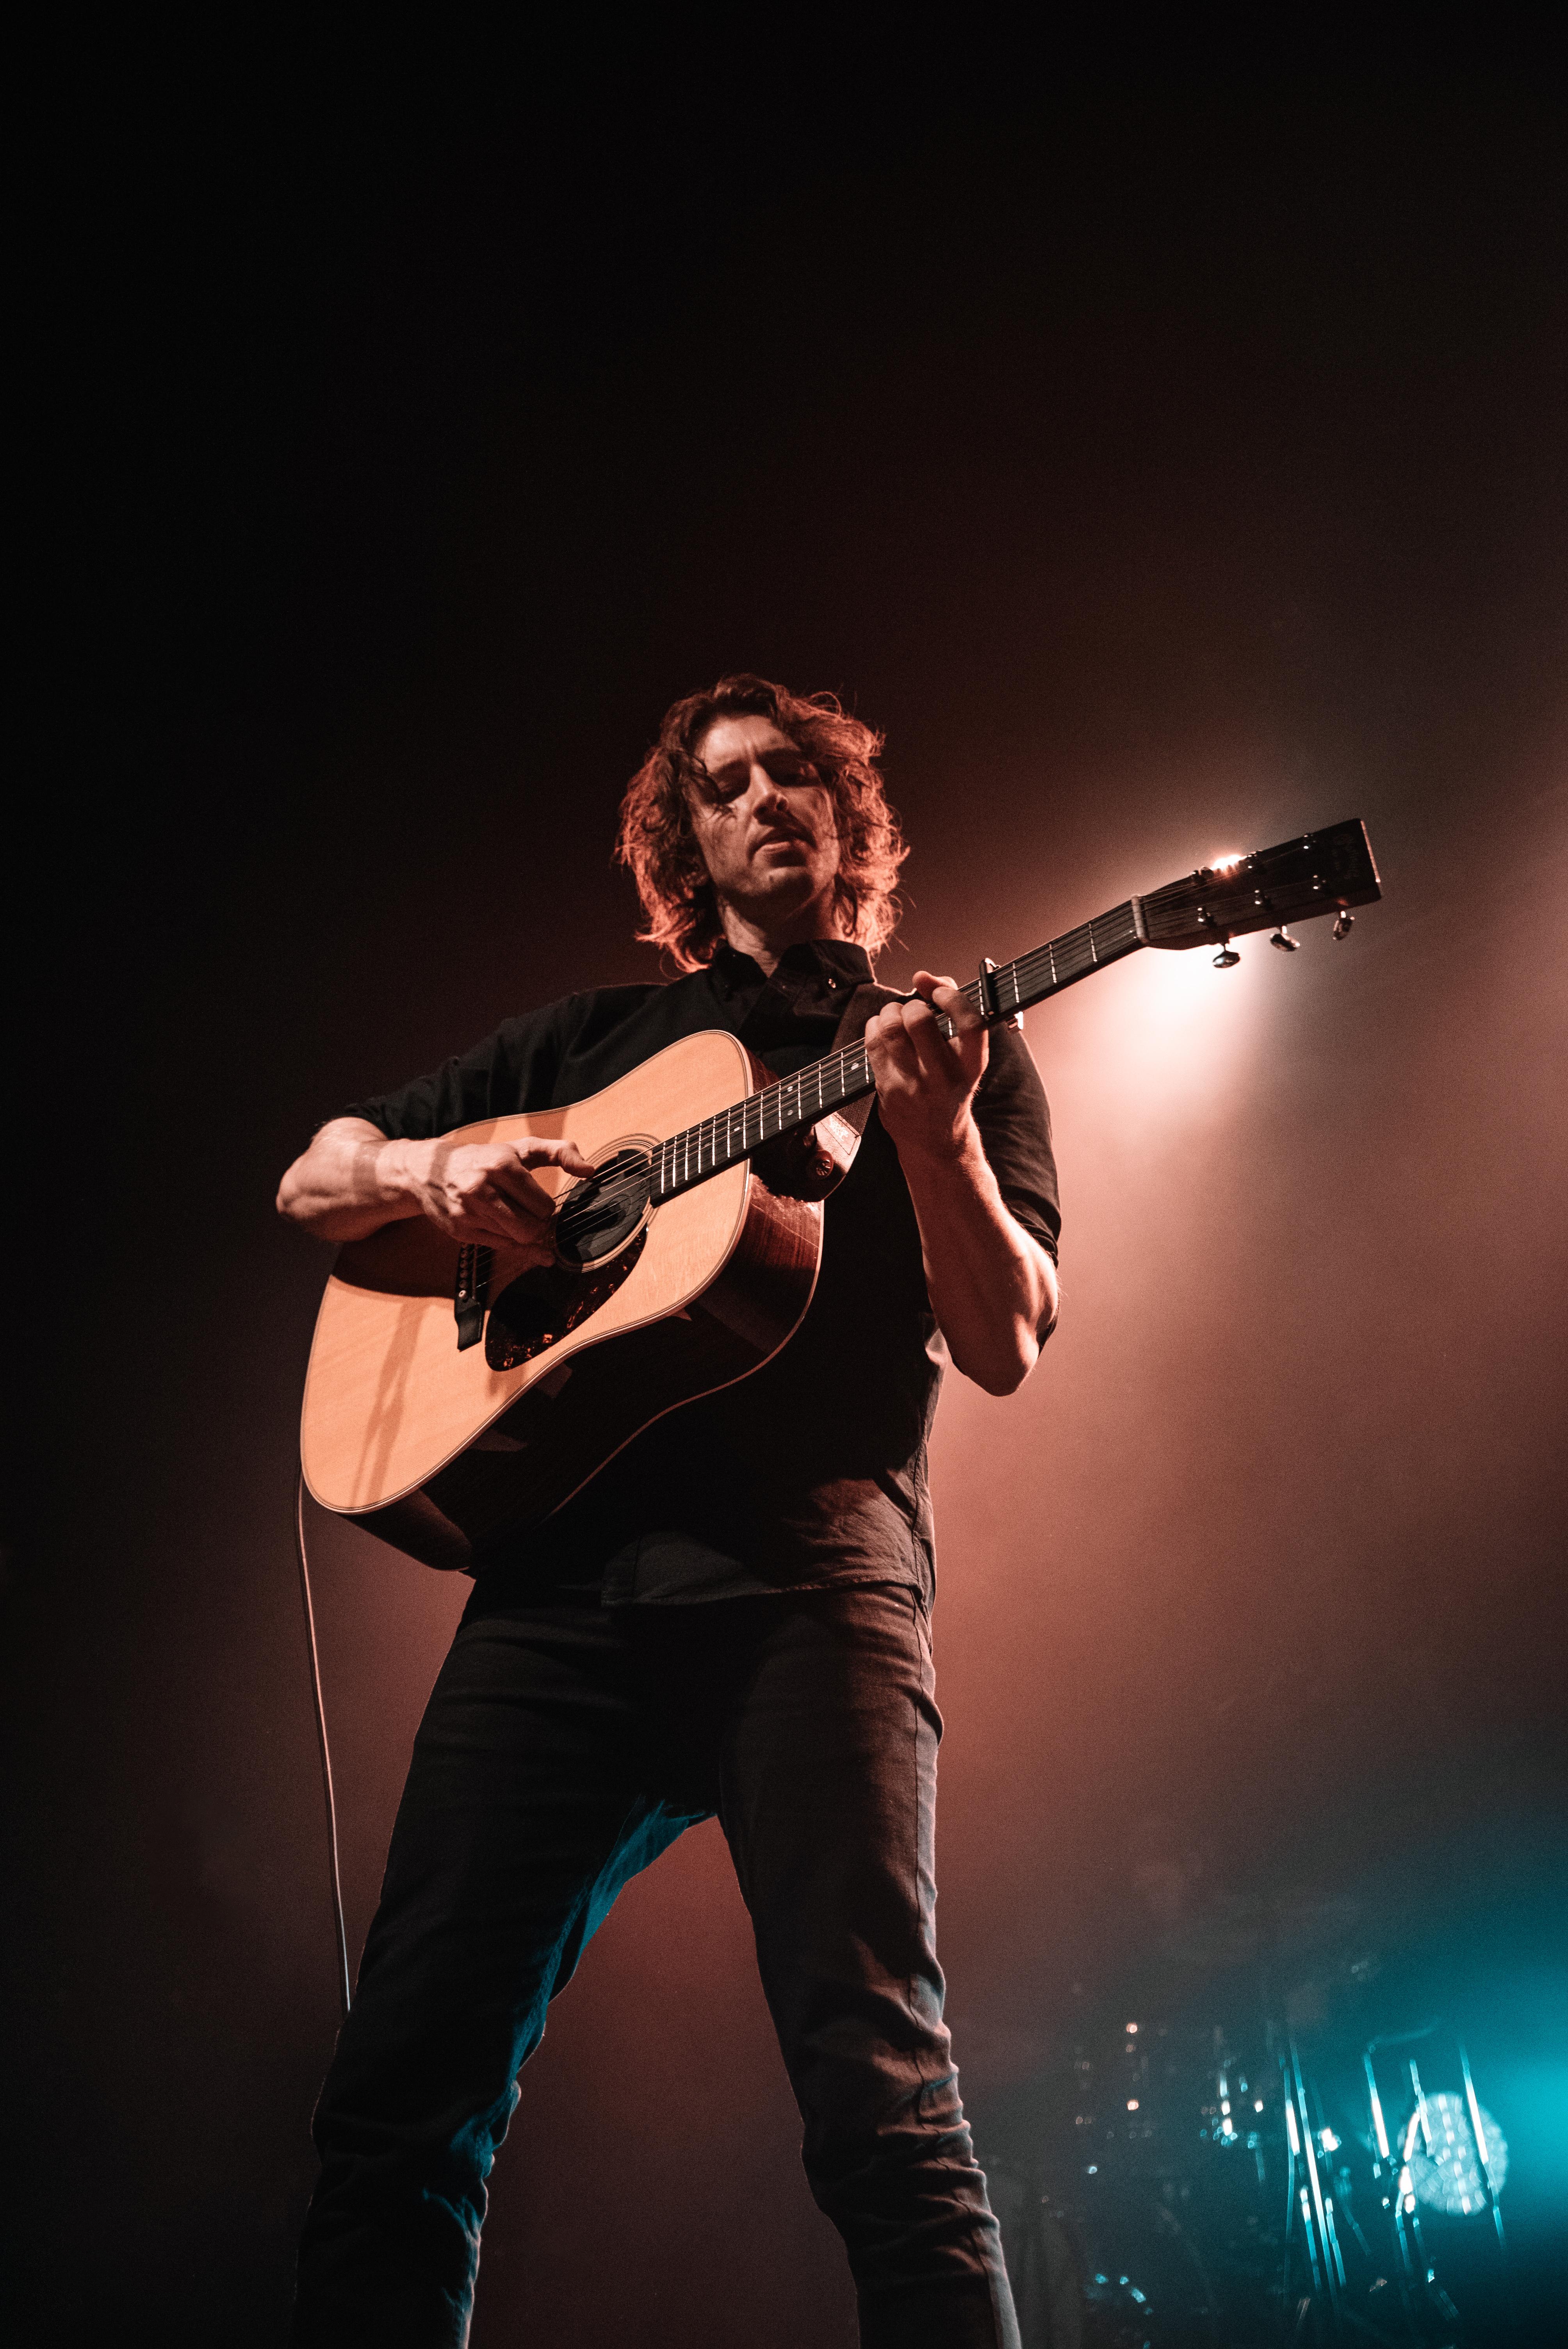 Dean Lewis – Noah Kahan // Manchester, UK 4.19.19